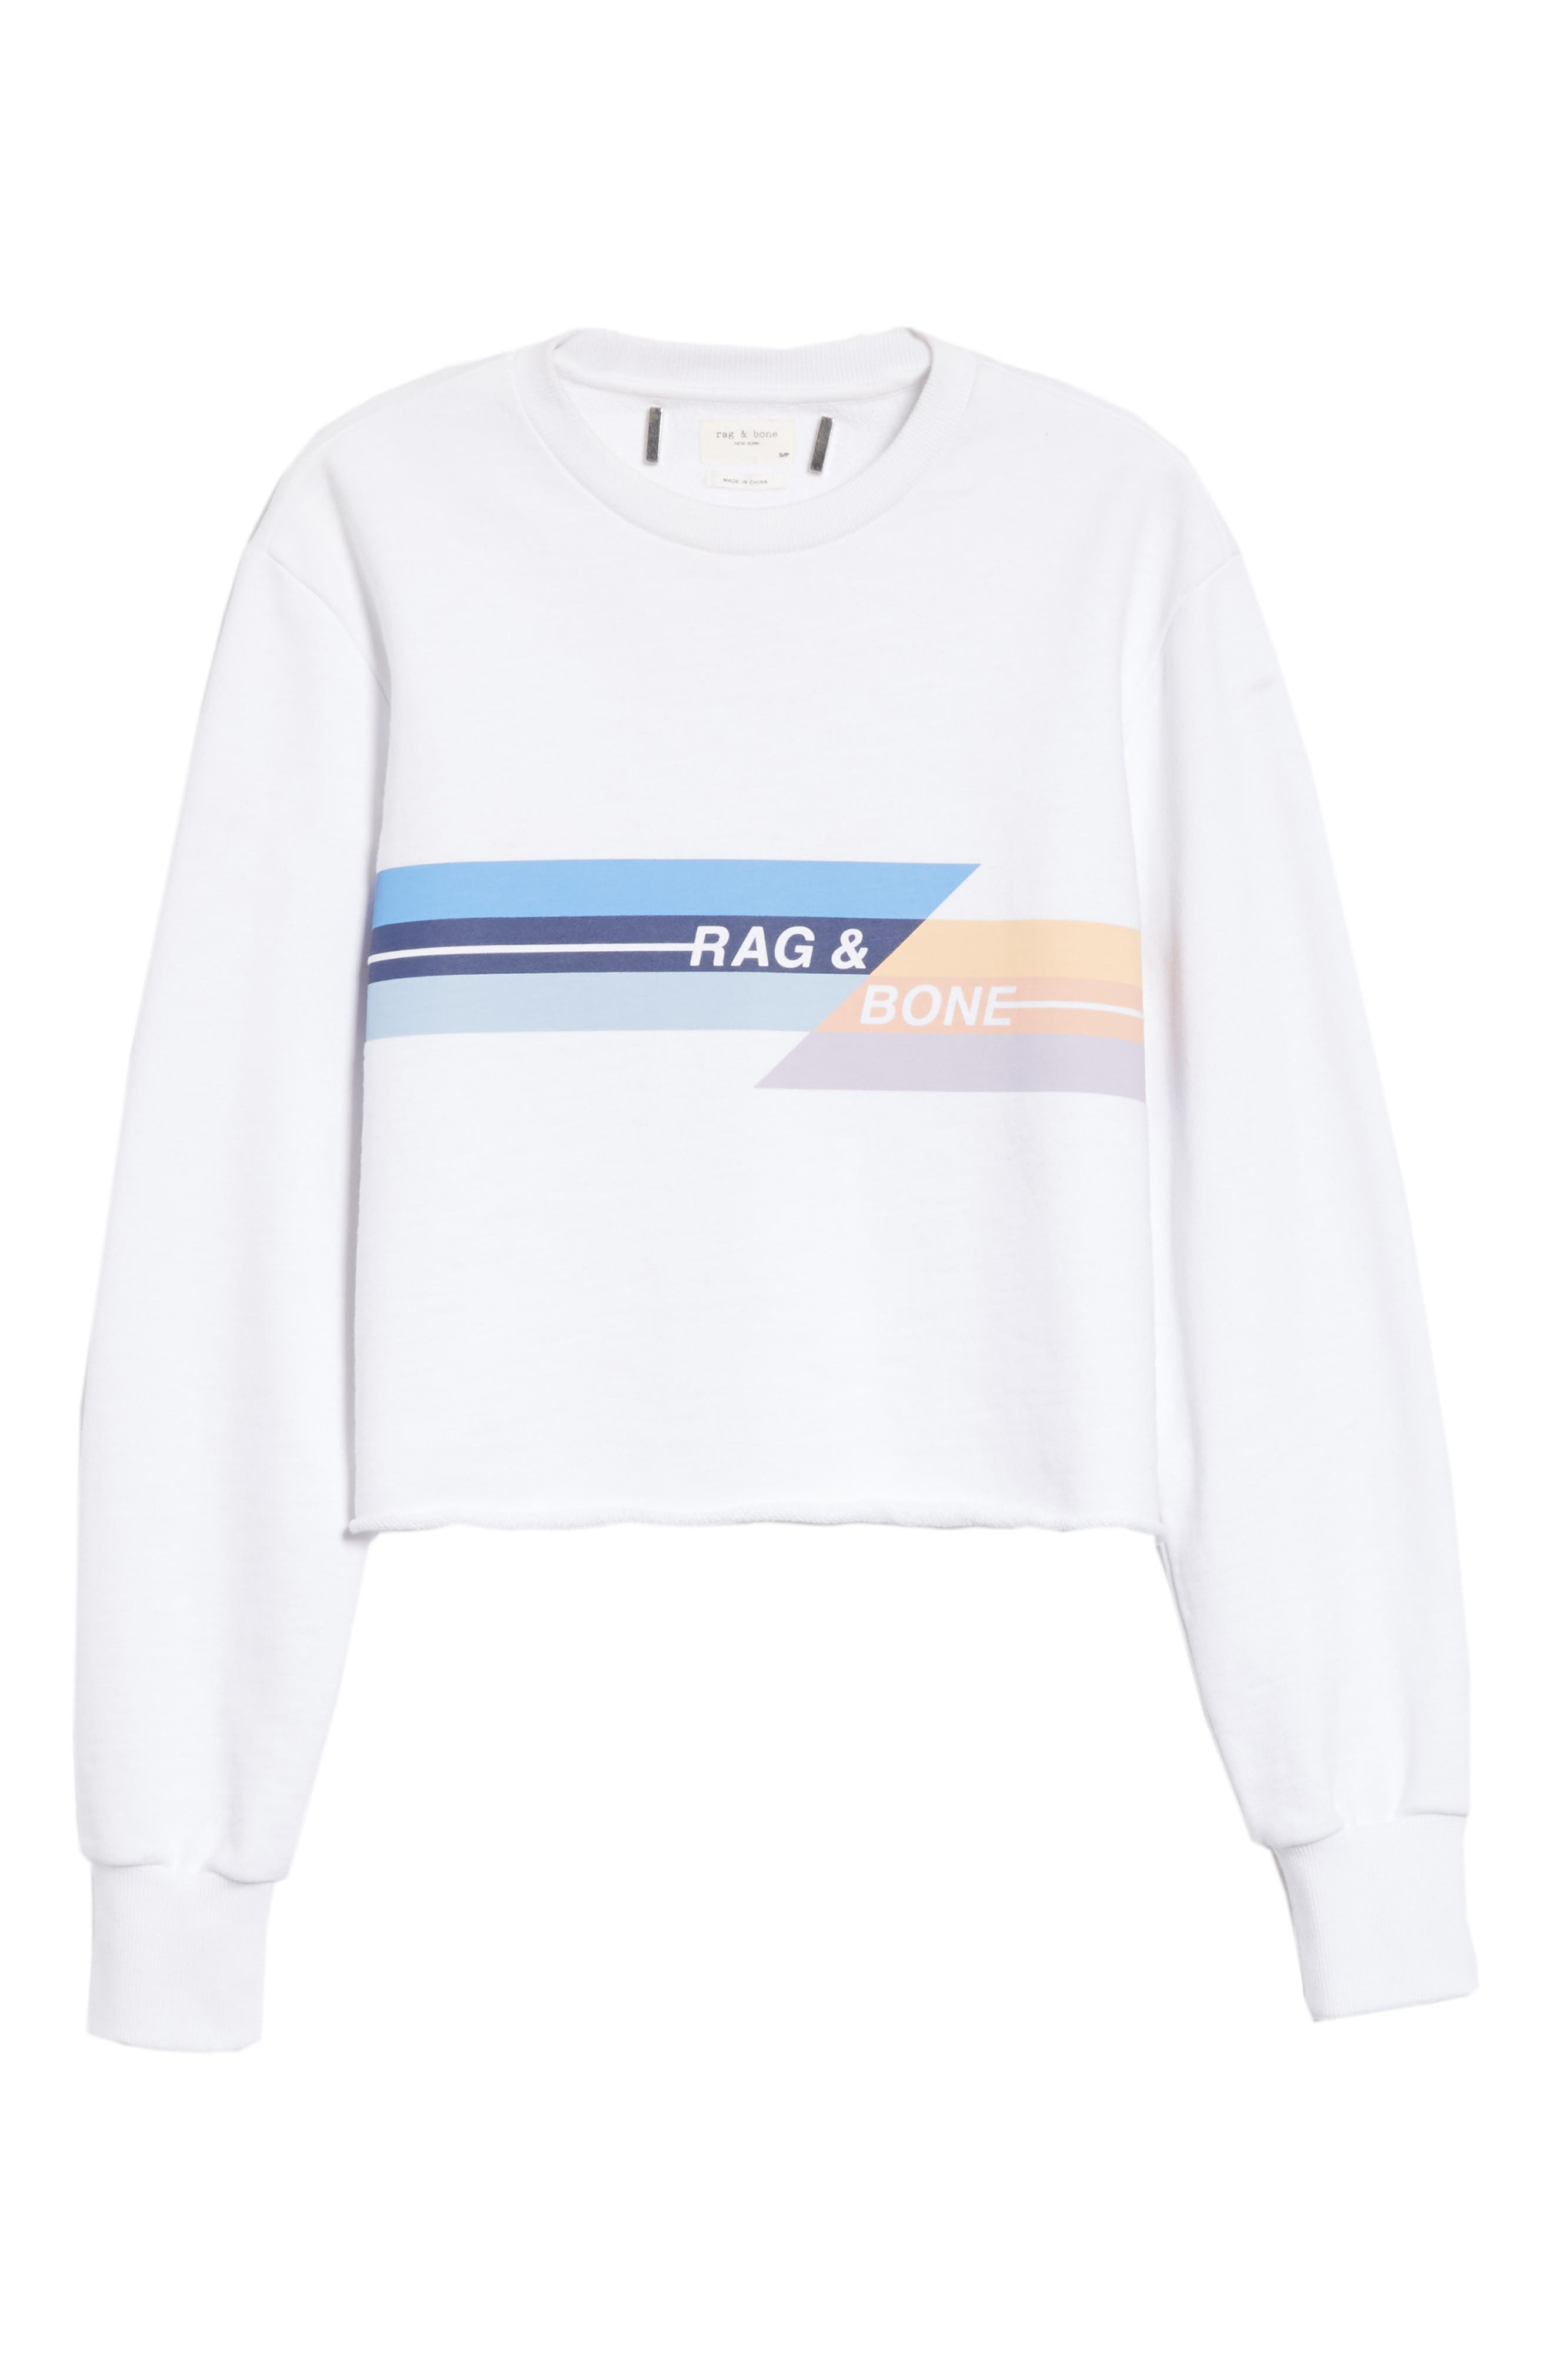 JEAN Glitch Crop Sweatshirt,                             Alternate thumbnail 6, color,                             100